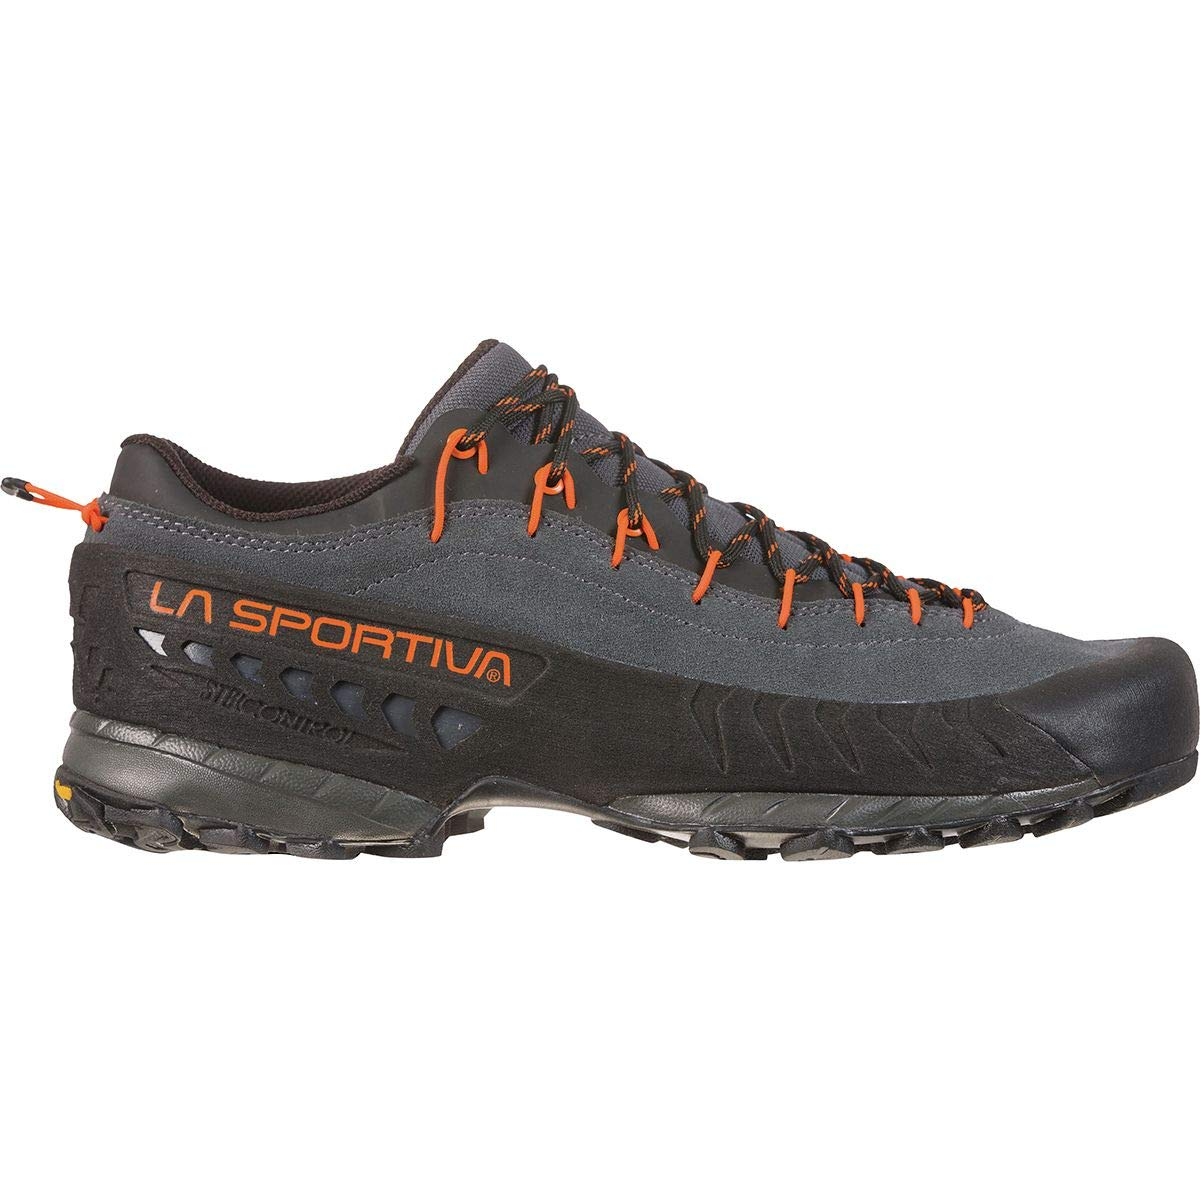 La Sportiva TX4 Approach Shoe, Carbon/Flame, 41